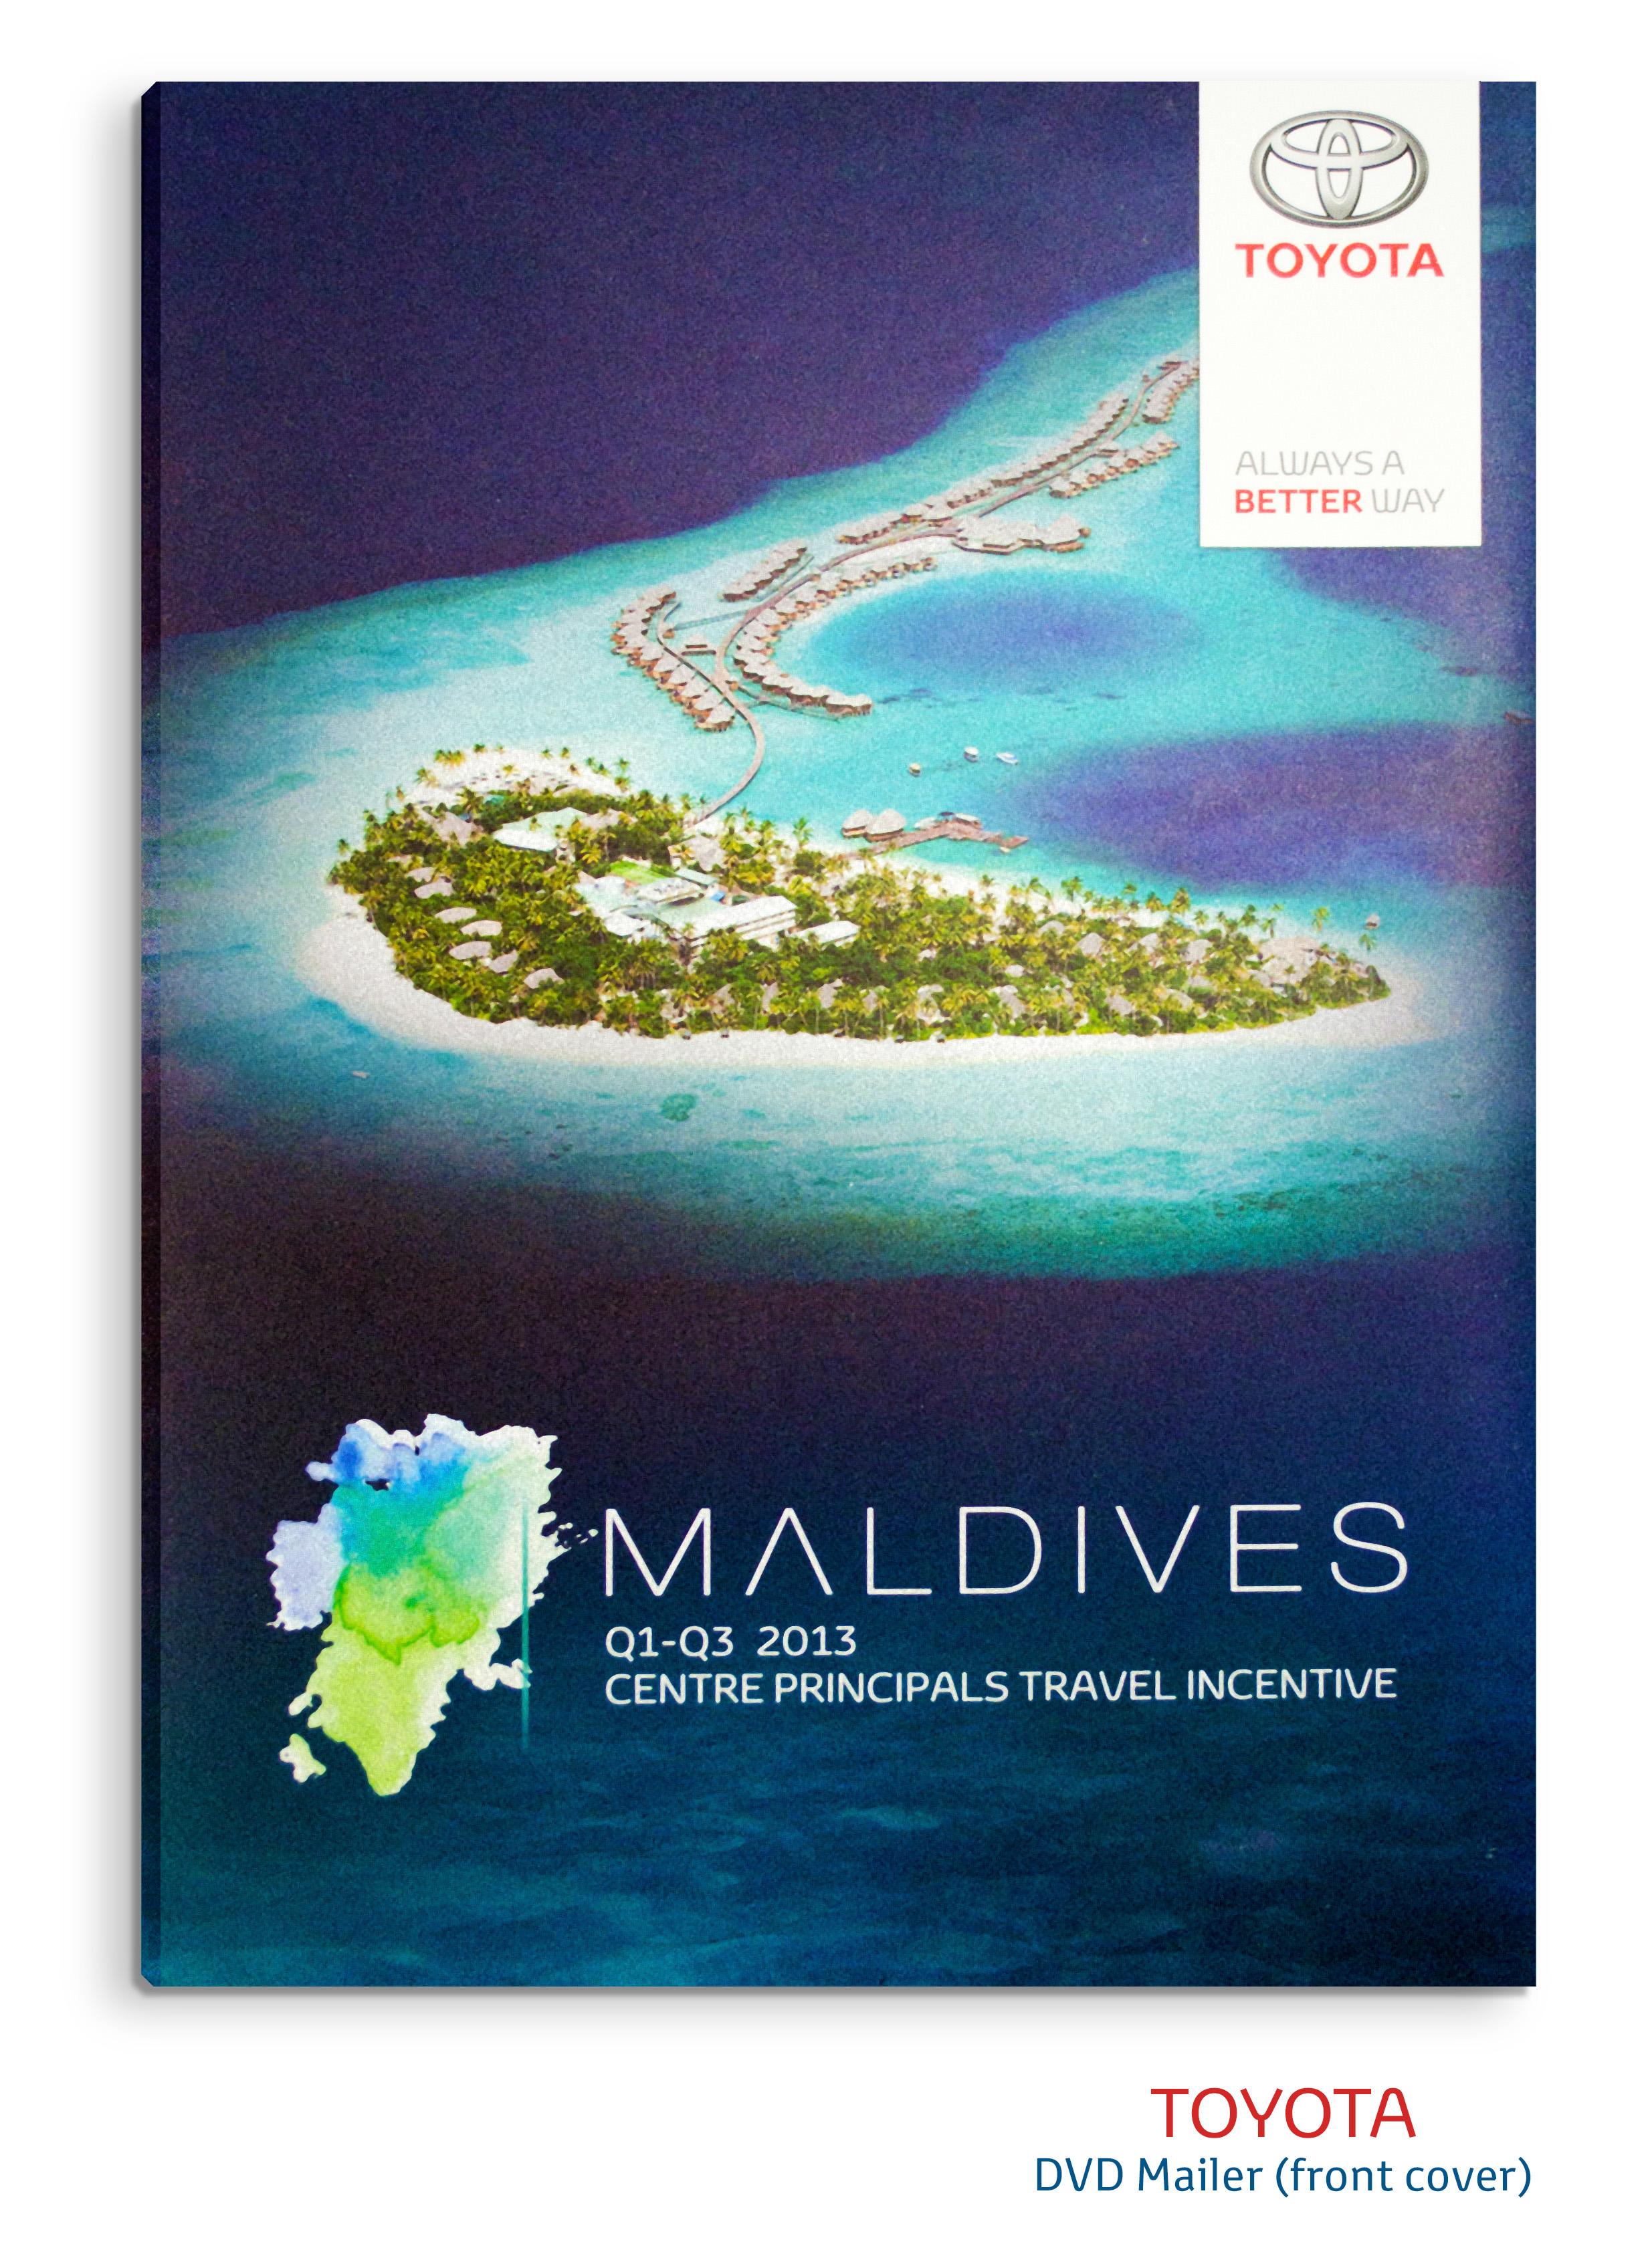 toyota for maldives